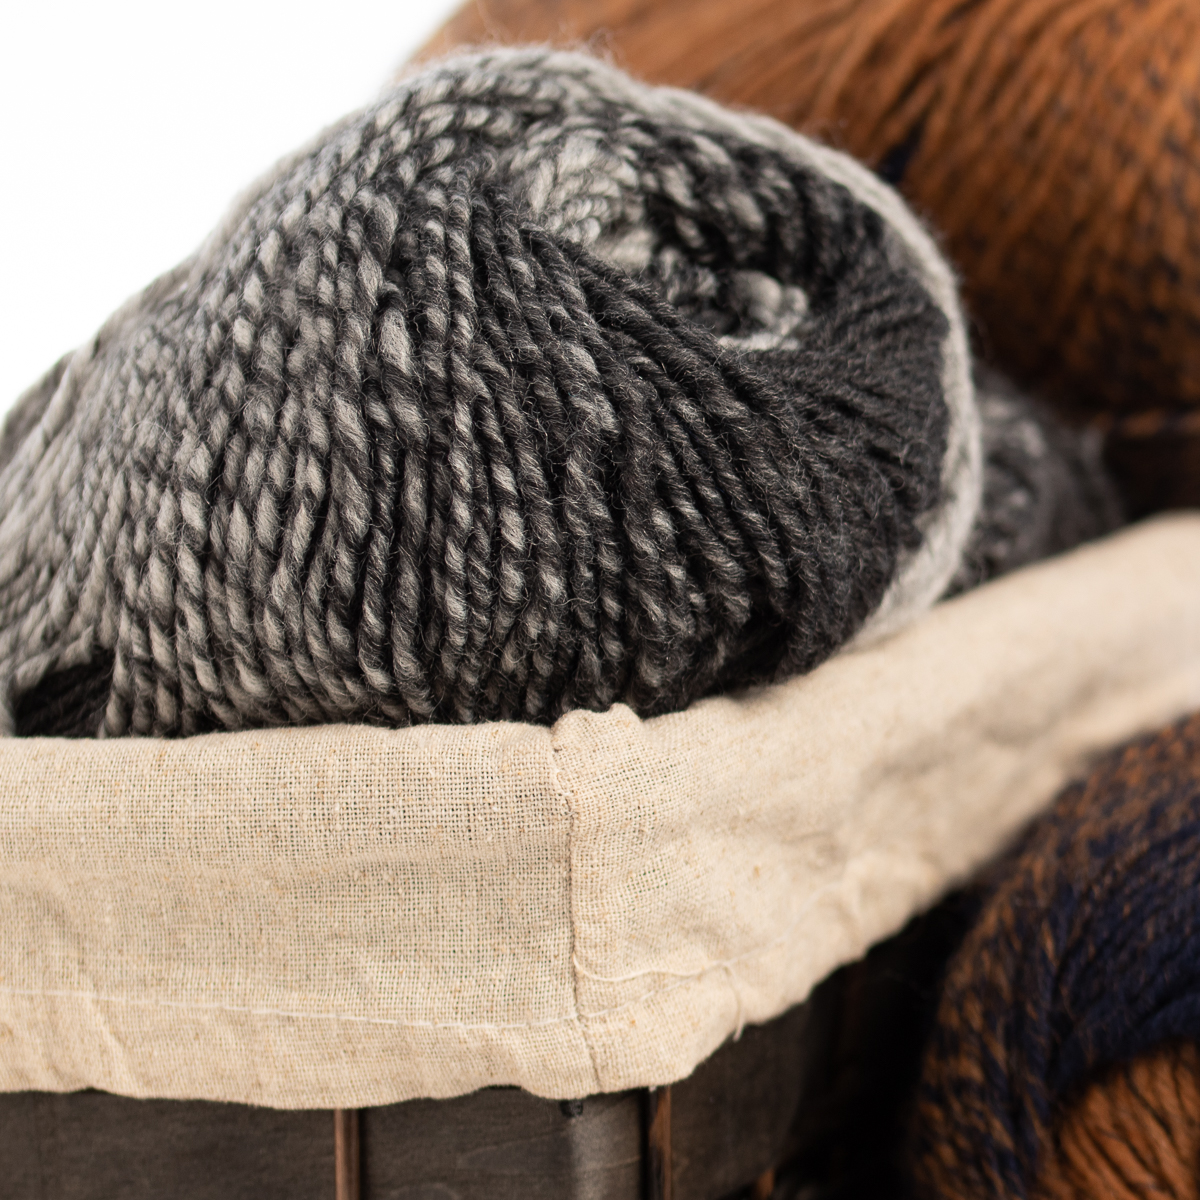 3pk-Lion-Brand-Scarfie-Acrylic-amp-Wool-Yarn-Bulky-5-Knitting-Crochet-Skeins-Soft thumbnail 11